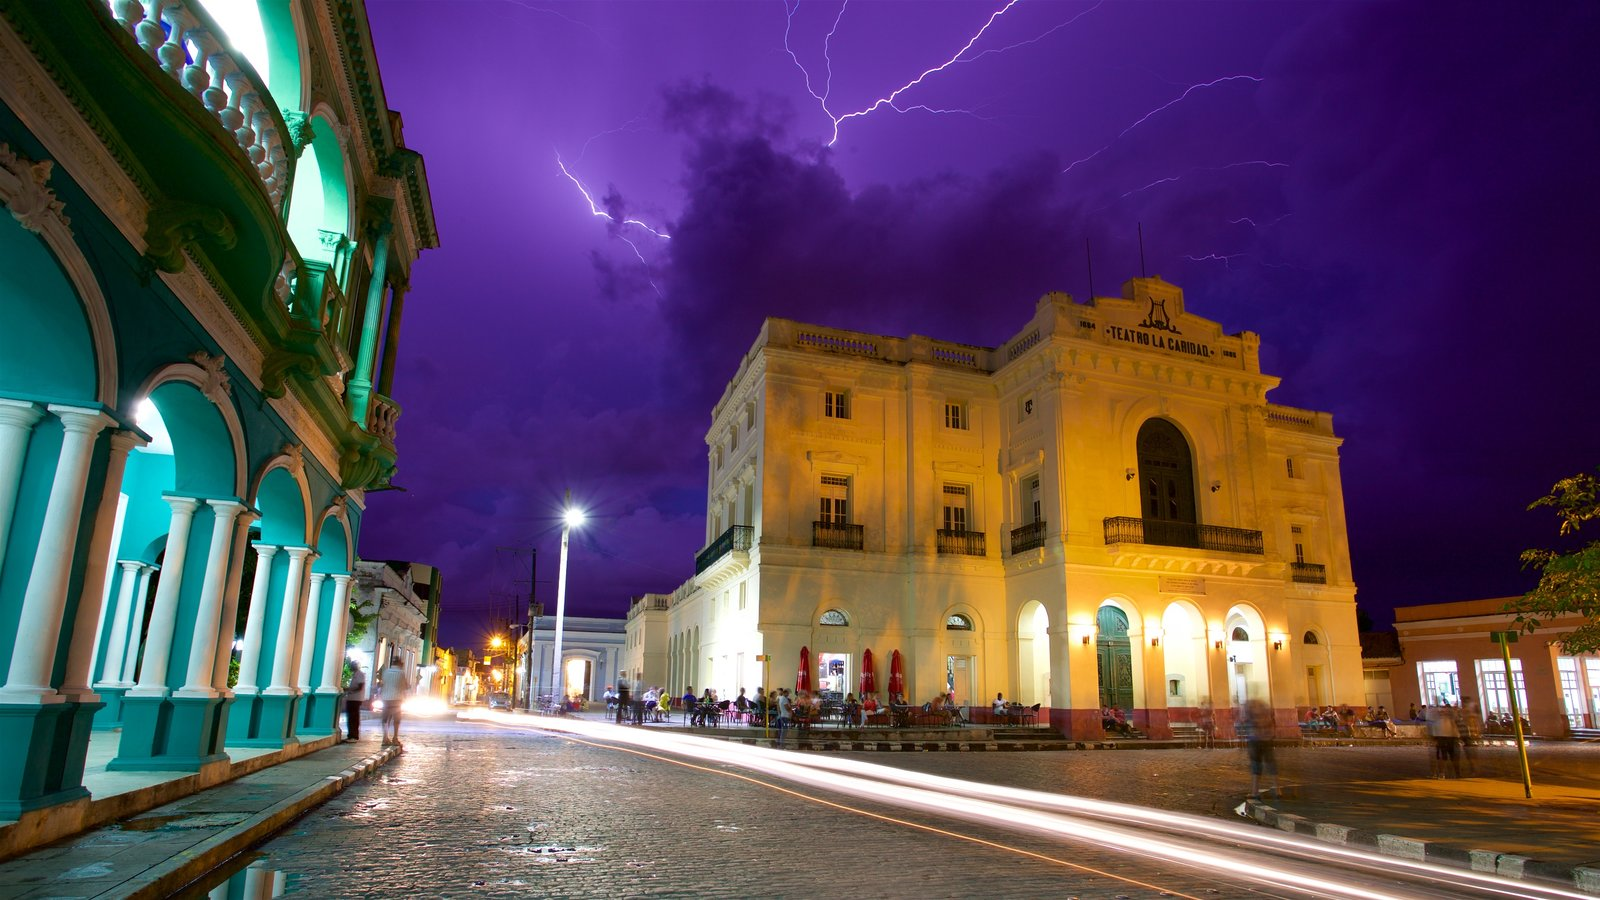 La Caridad Theatre mostrando cenas noturnas e arquitetura de patrimônio